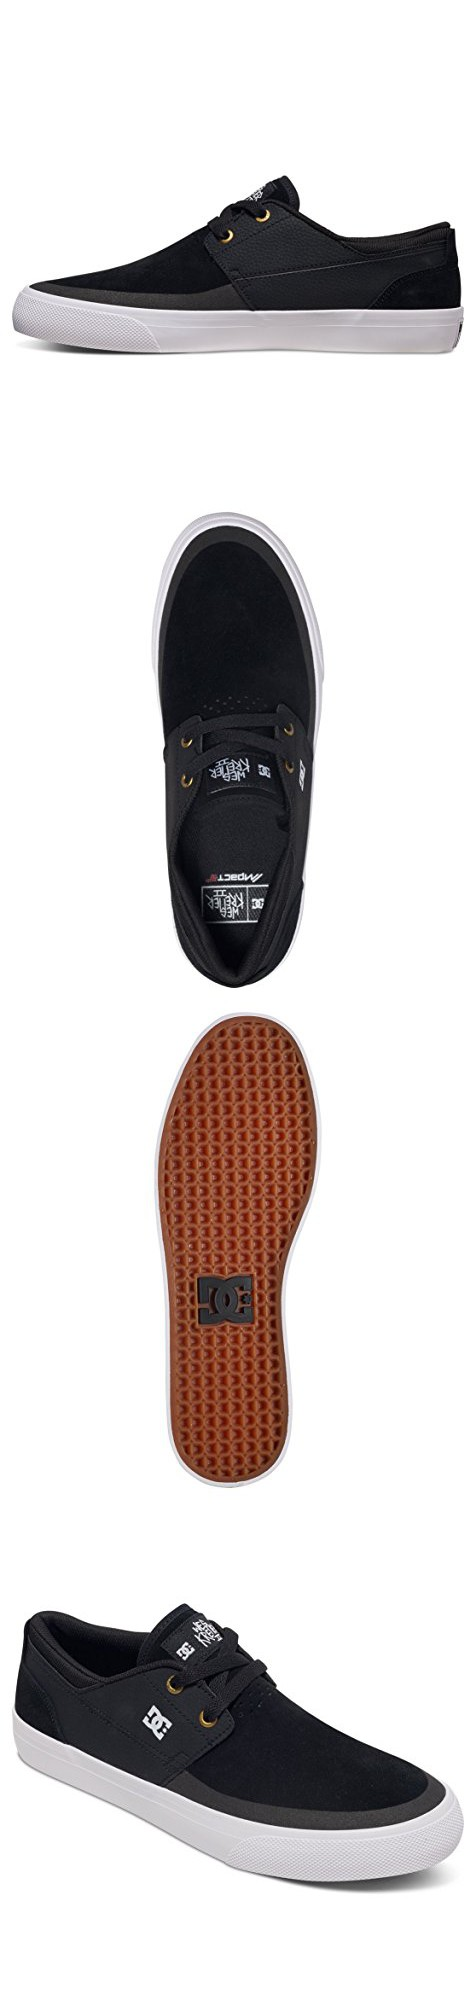 Skate shoes size 9 - Dc Mens Wes Kremer 2 S Skate Shoes Size 9 D M